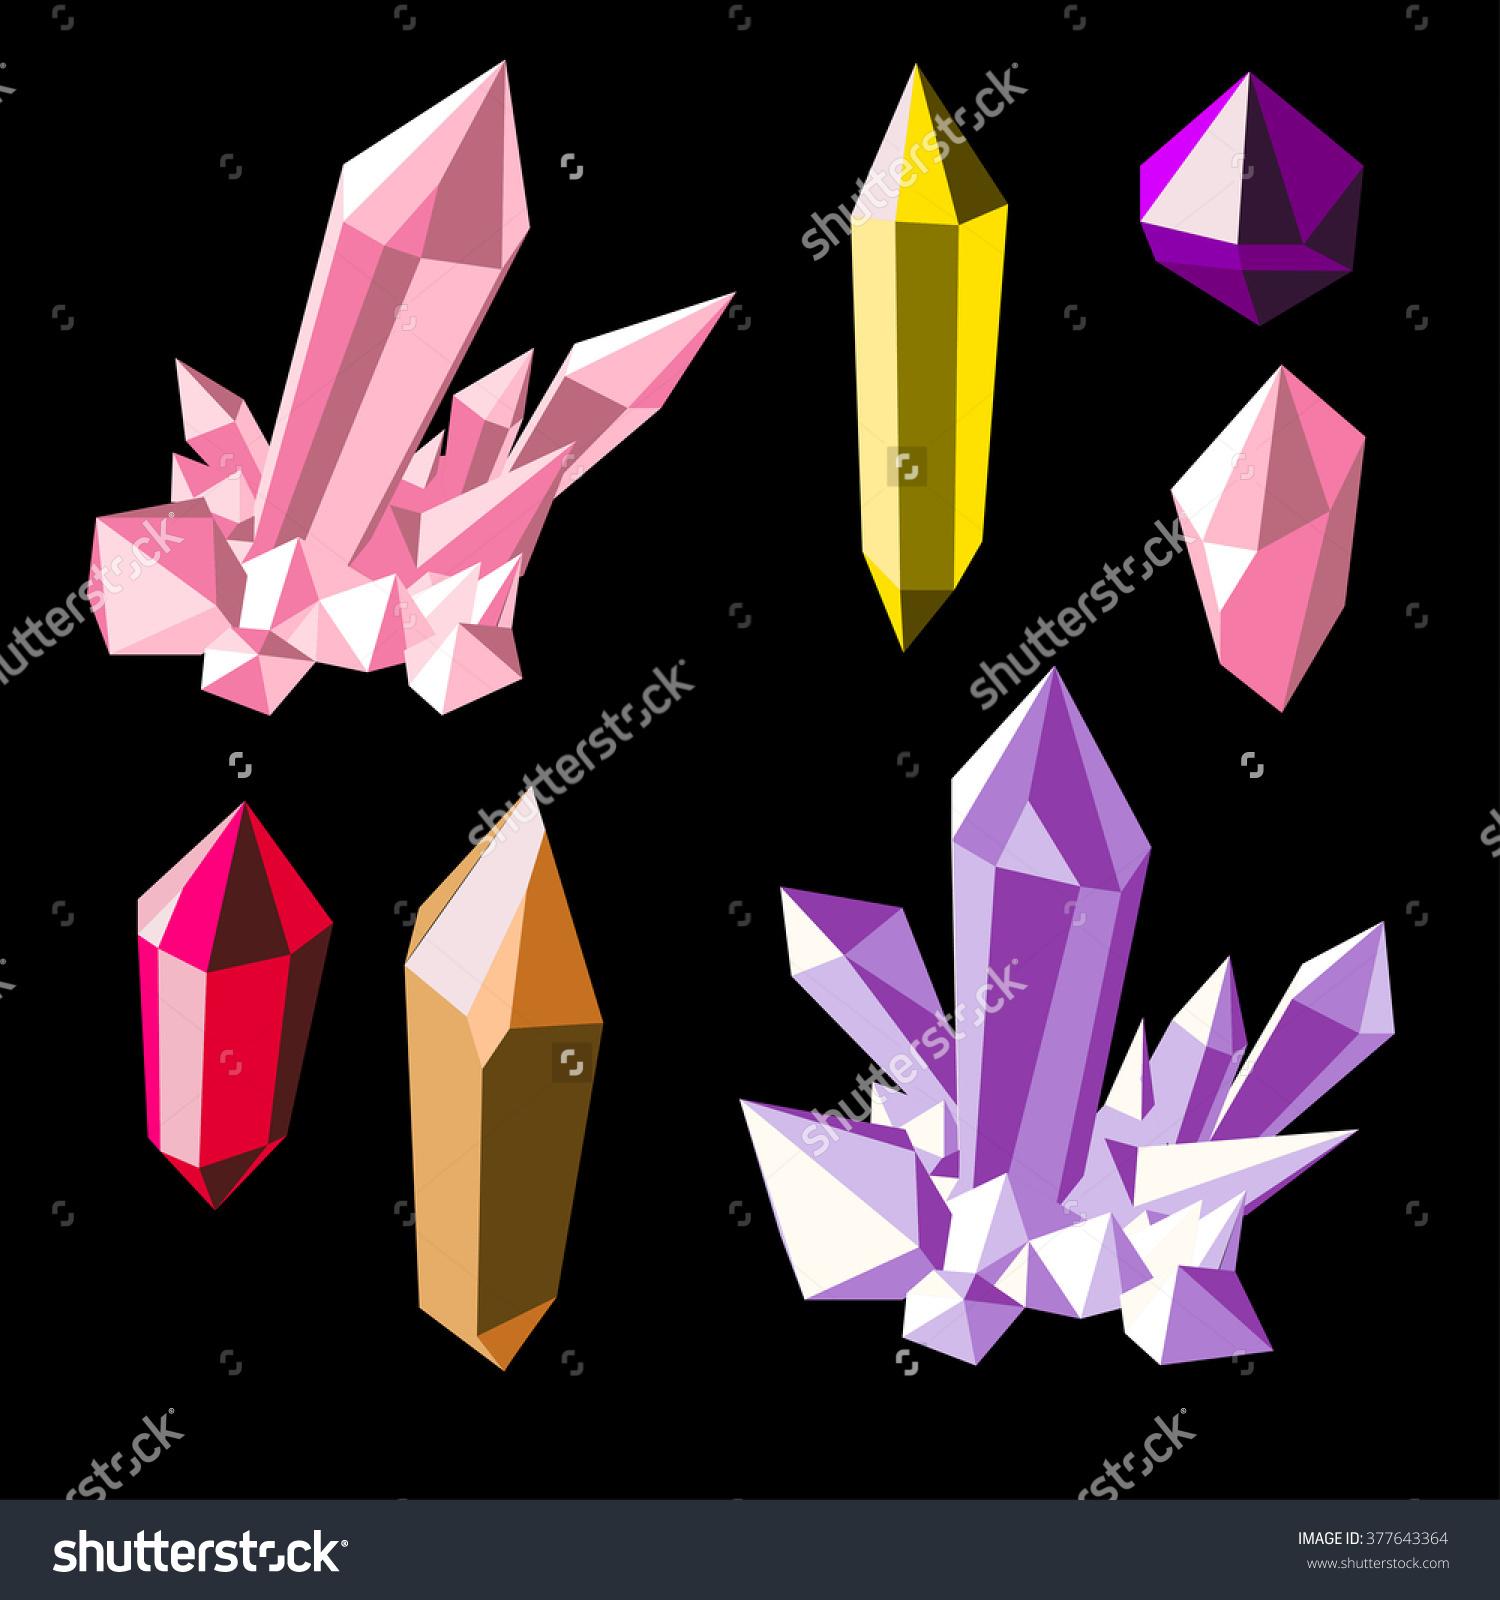 Crystals clipart shiny Bright Crystals Shiny Quartz collection